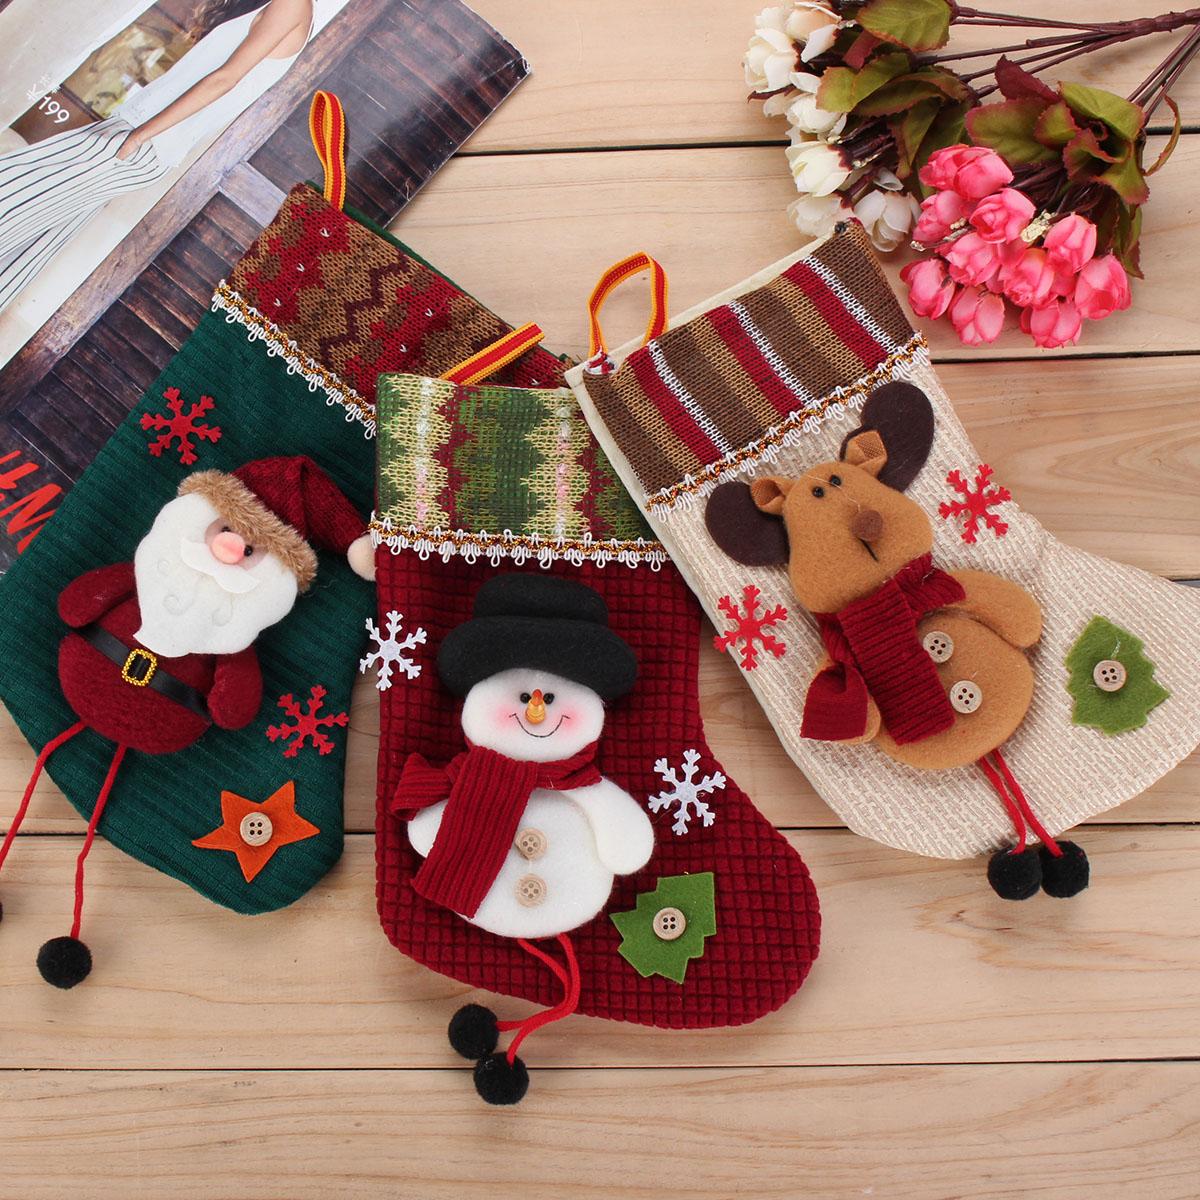 Christmas Santa Claus Hanging Gift Sock Christmas Hanging Ornament